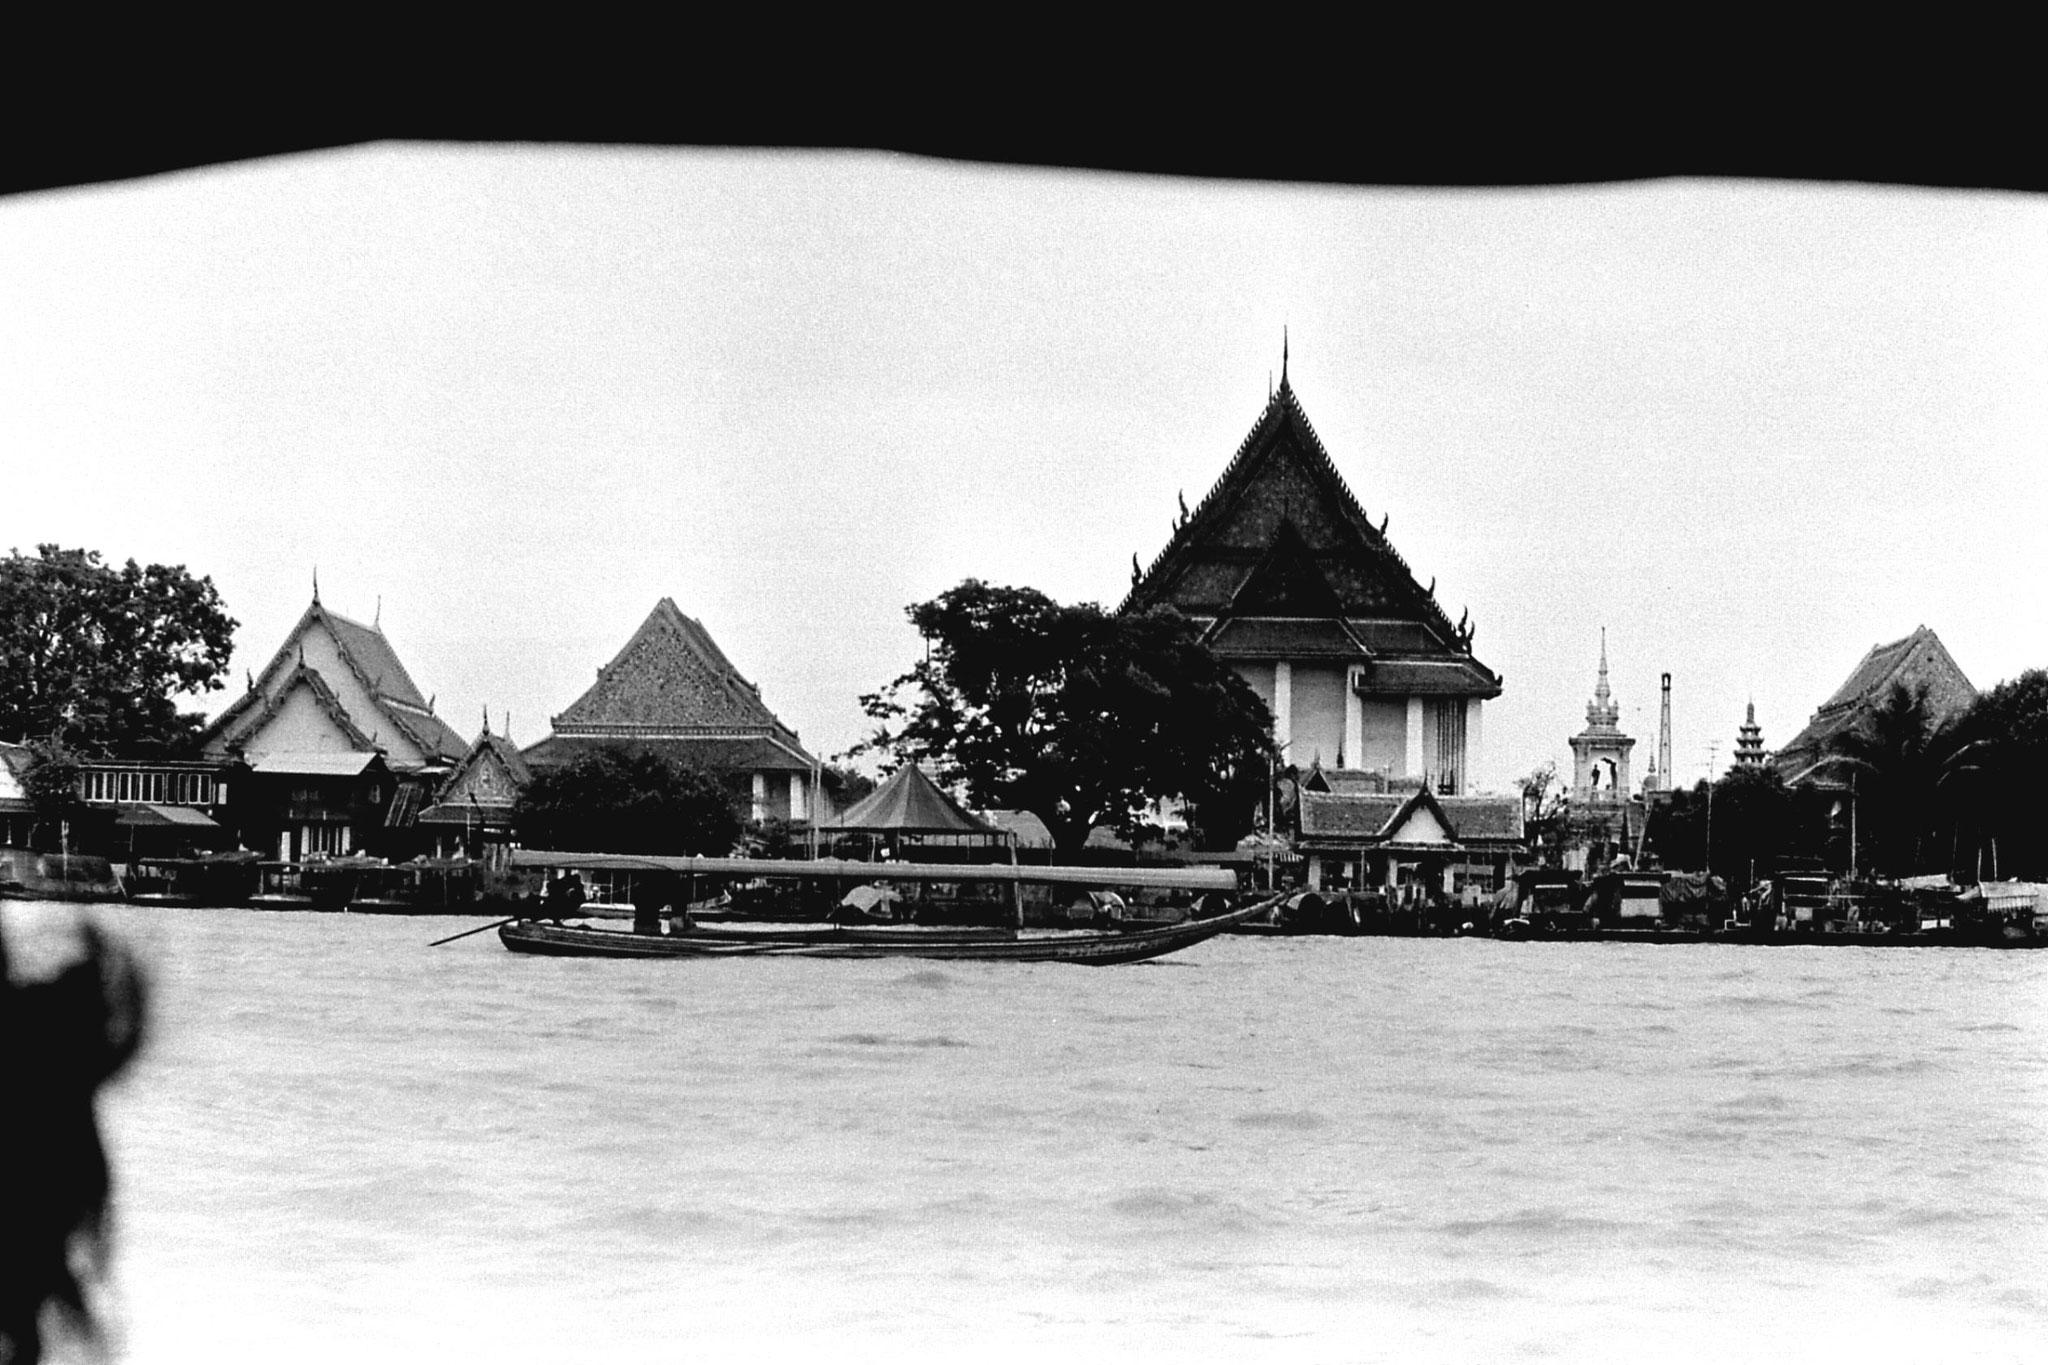 17/6/1990: 21: Bangkok, on the river Wat Kalayanamit